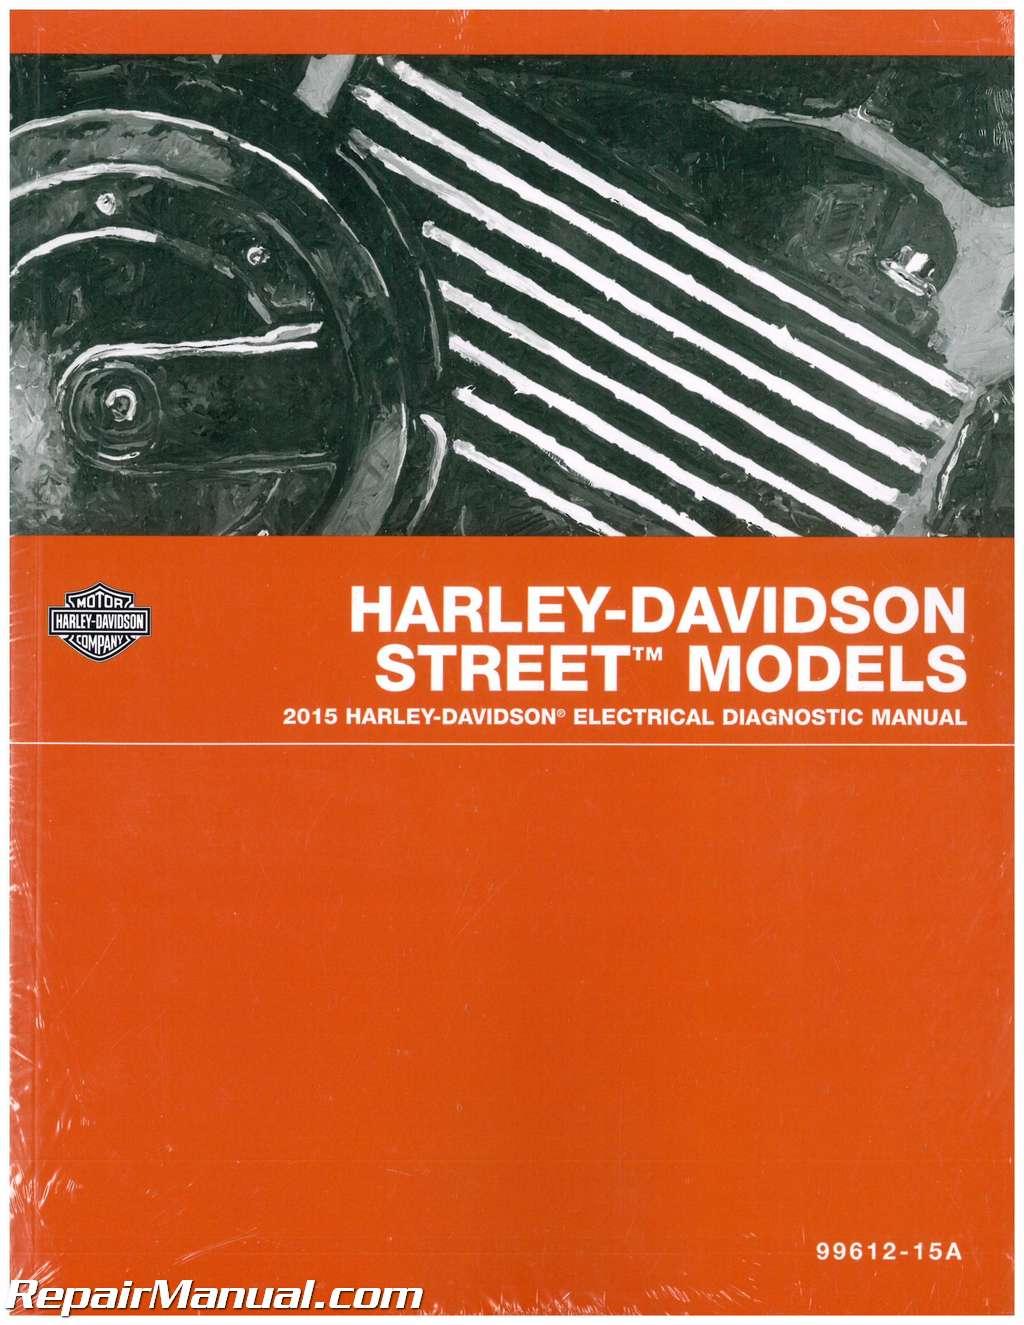 2015 Harley Davidson XG500 XG750 Street Models Electrical Diagnostic Manual honda vt500 wiring diagram wiring diagram libraries